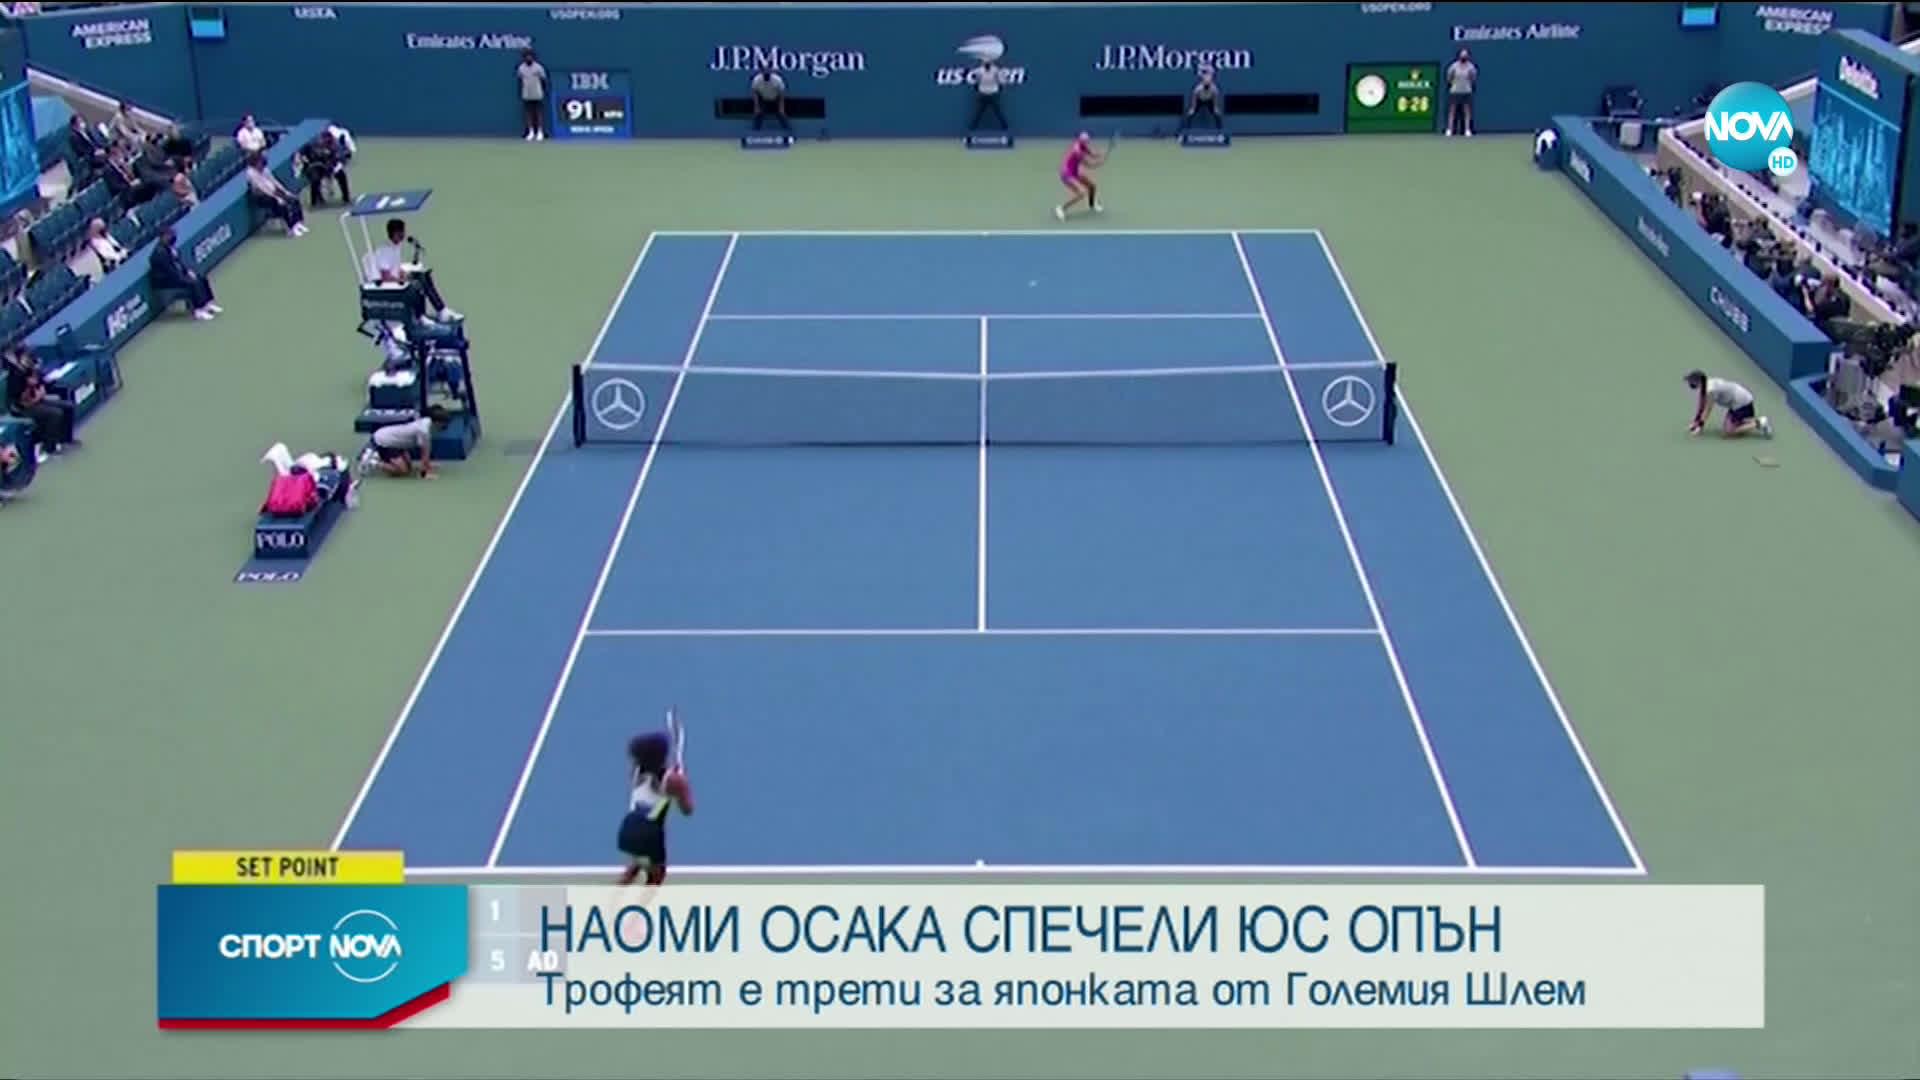 Осака спечели US Open след обрат над Азаренка